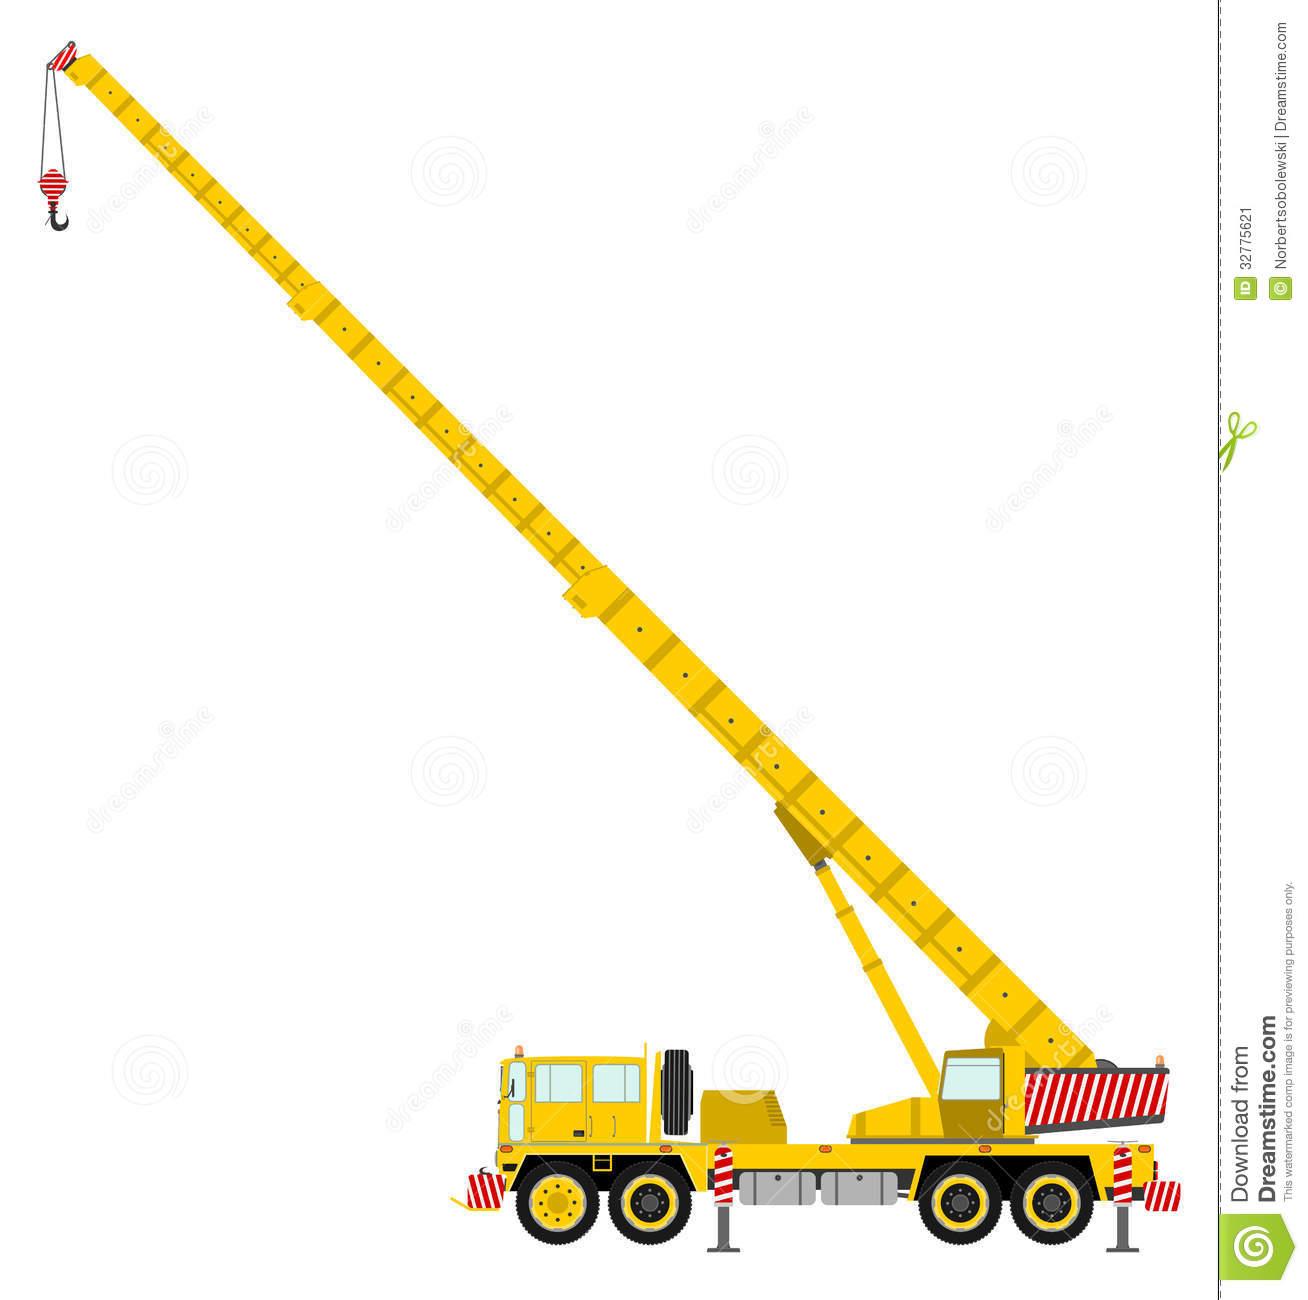 Crane clipart yellow. Mobile silhouette panda free